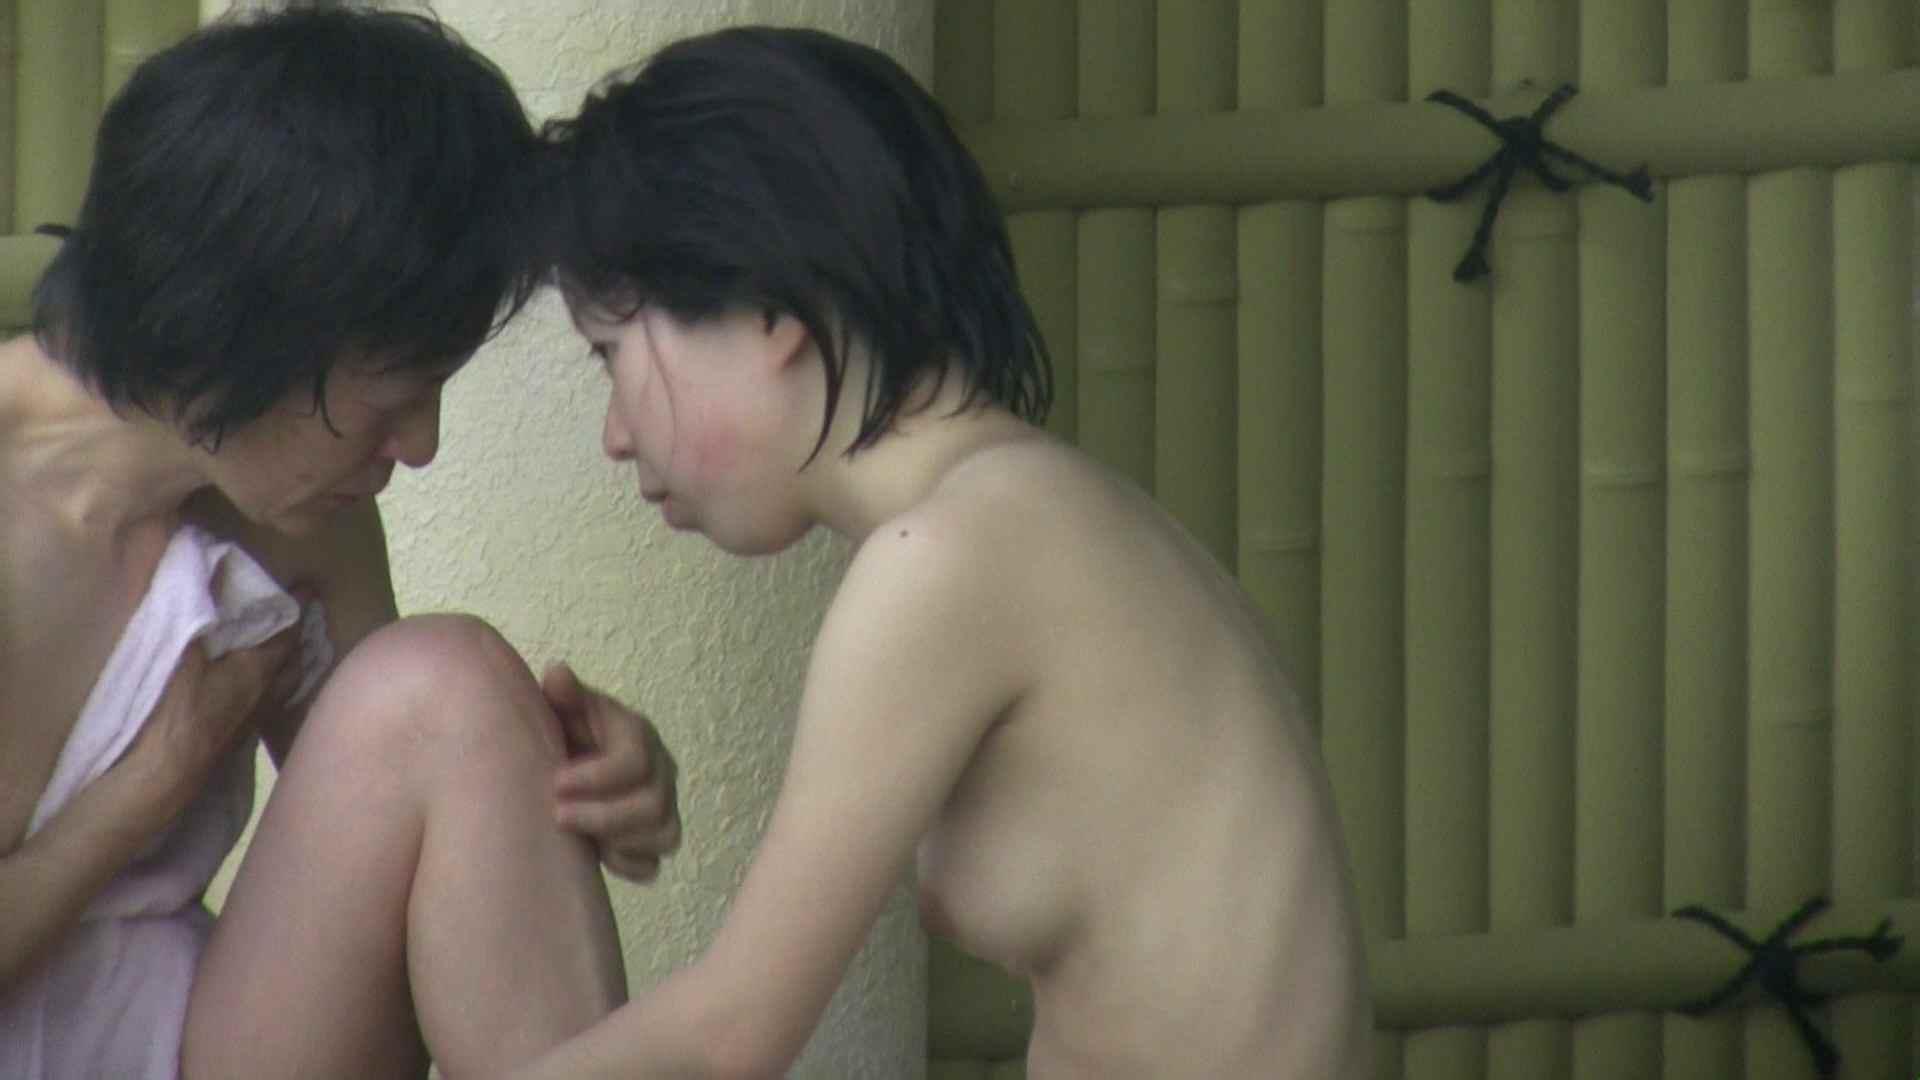 Aquaな露天風呂Vol.06【VIP】 いやらしいOL 性交動画流出 96連発 22